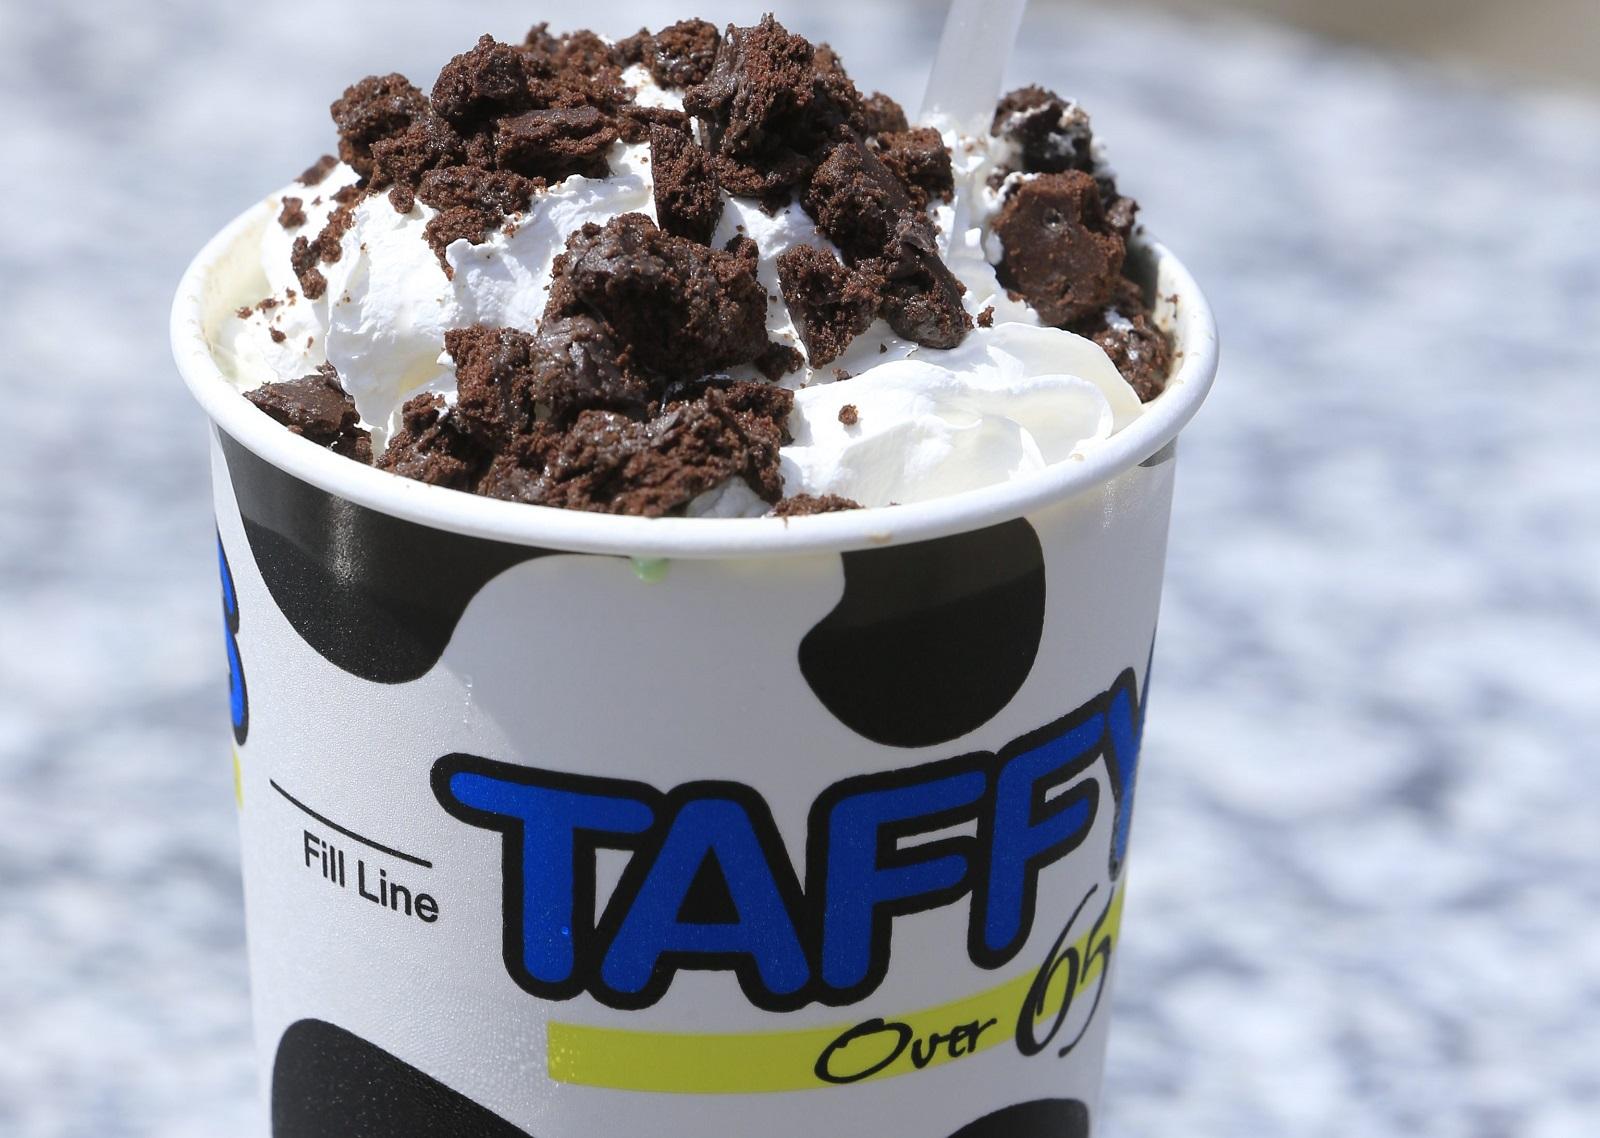 A milkshake at Taffy's on Friday, June 26, 2015. (Harry Scull Jr/Buffalo News)